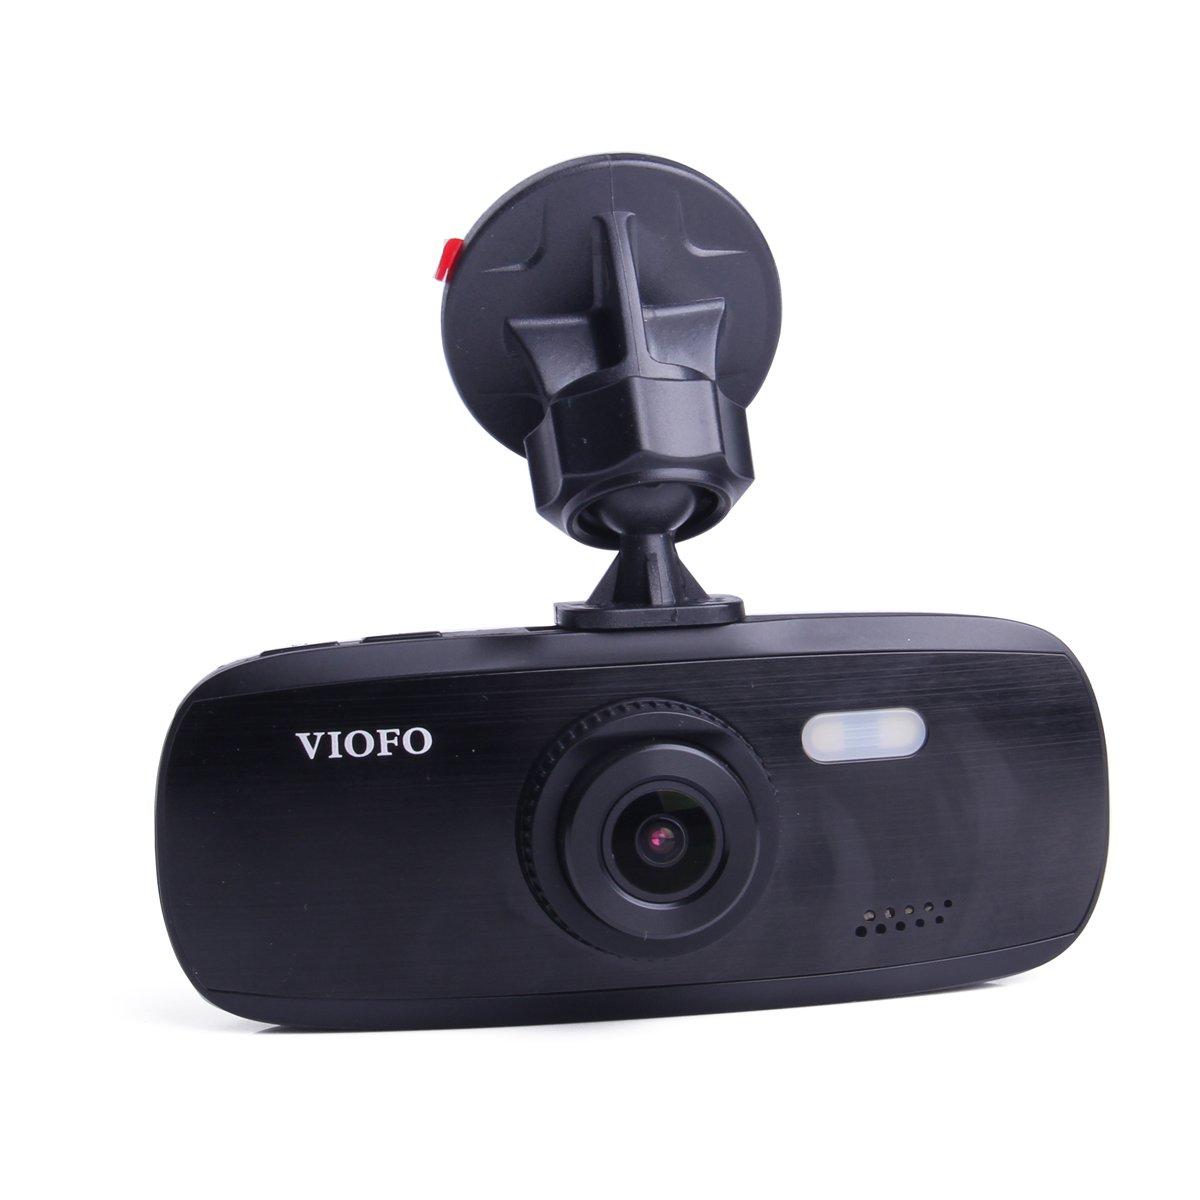 G1W-S Car Dash Camera   Full 1080P HD Video & Audio Recording Car DVR Camera Recorder   G-Sensor Capabilities   NT96650 + Sony IMX323   New 2017 Model